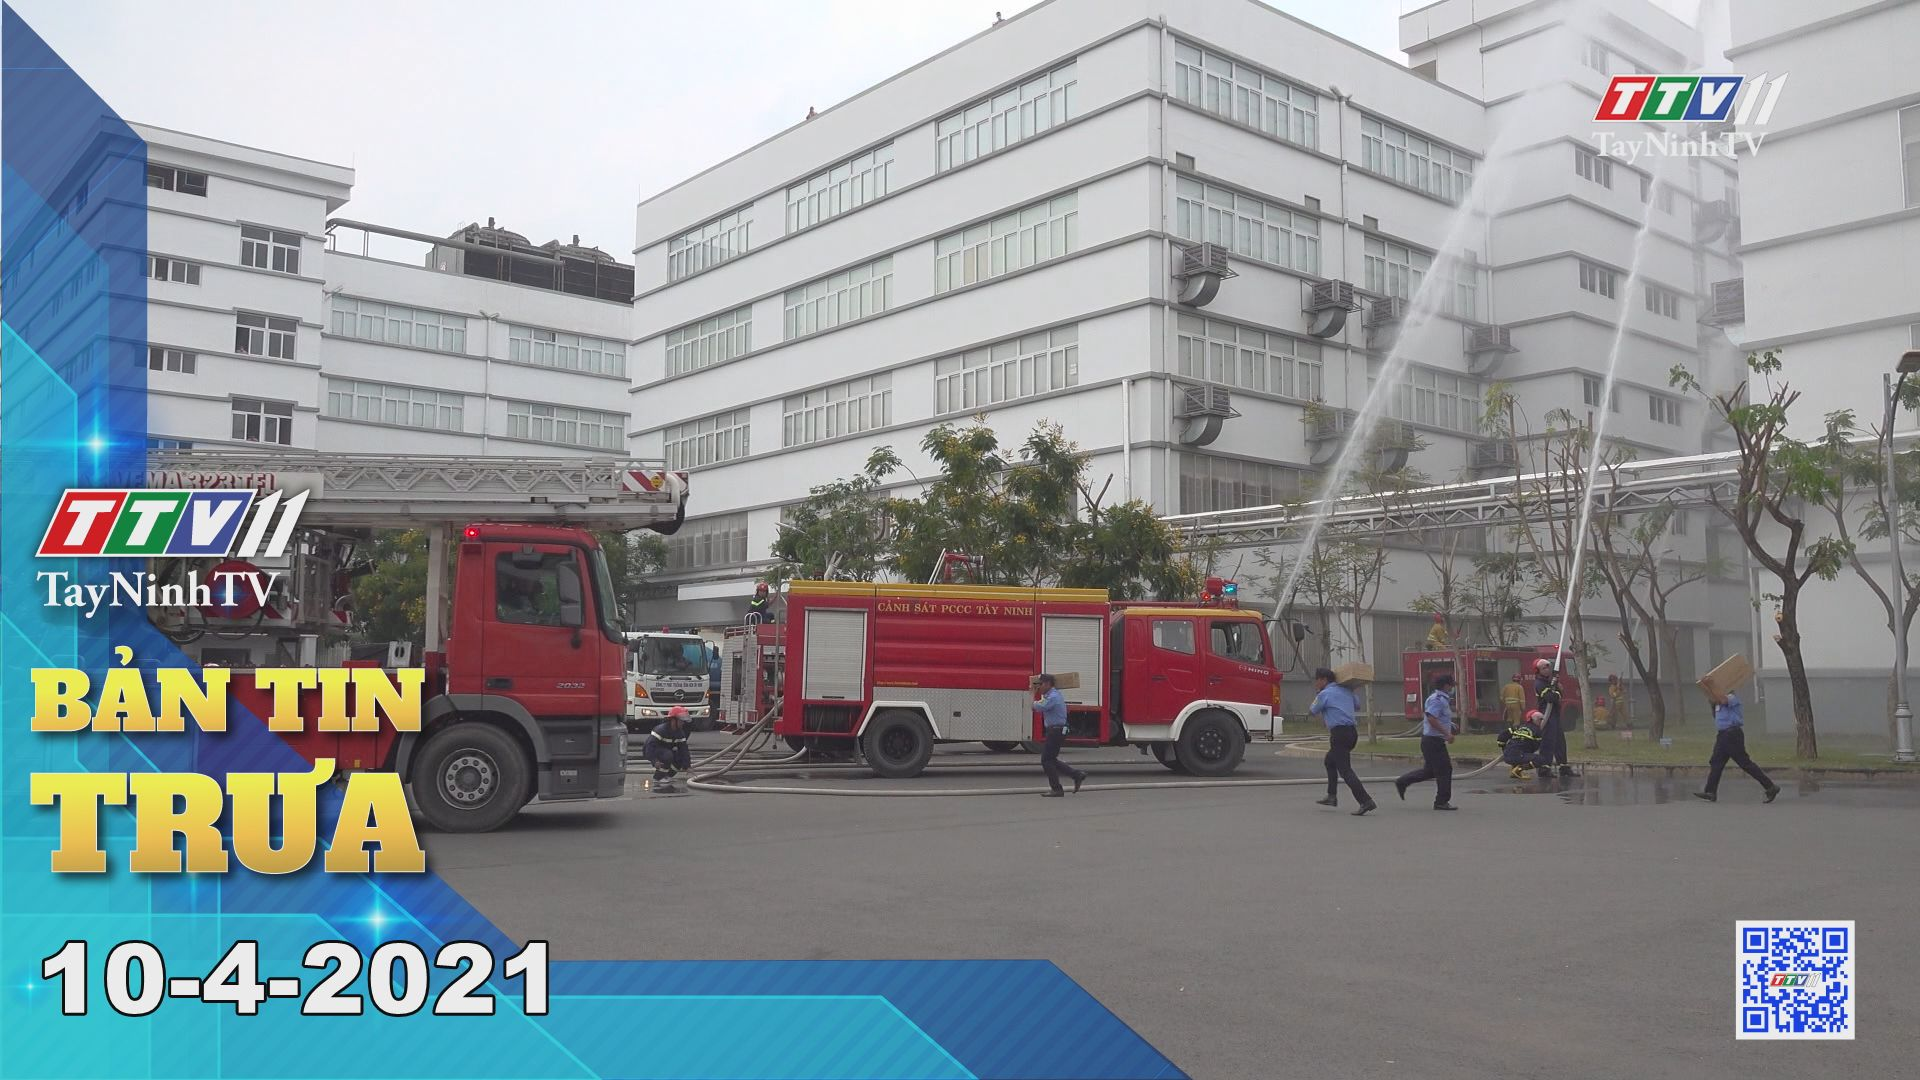 Bản tin trưa 10-4-2021 | Tin tức hôm nay | TayNinhTV